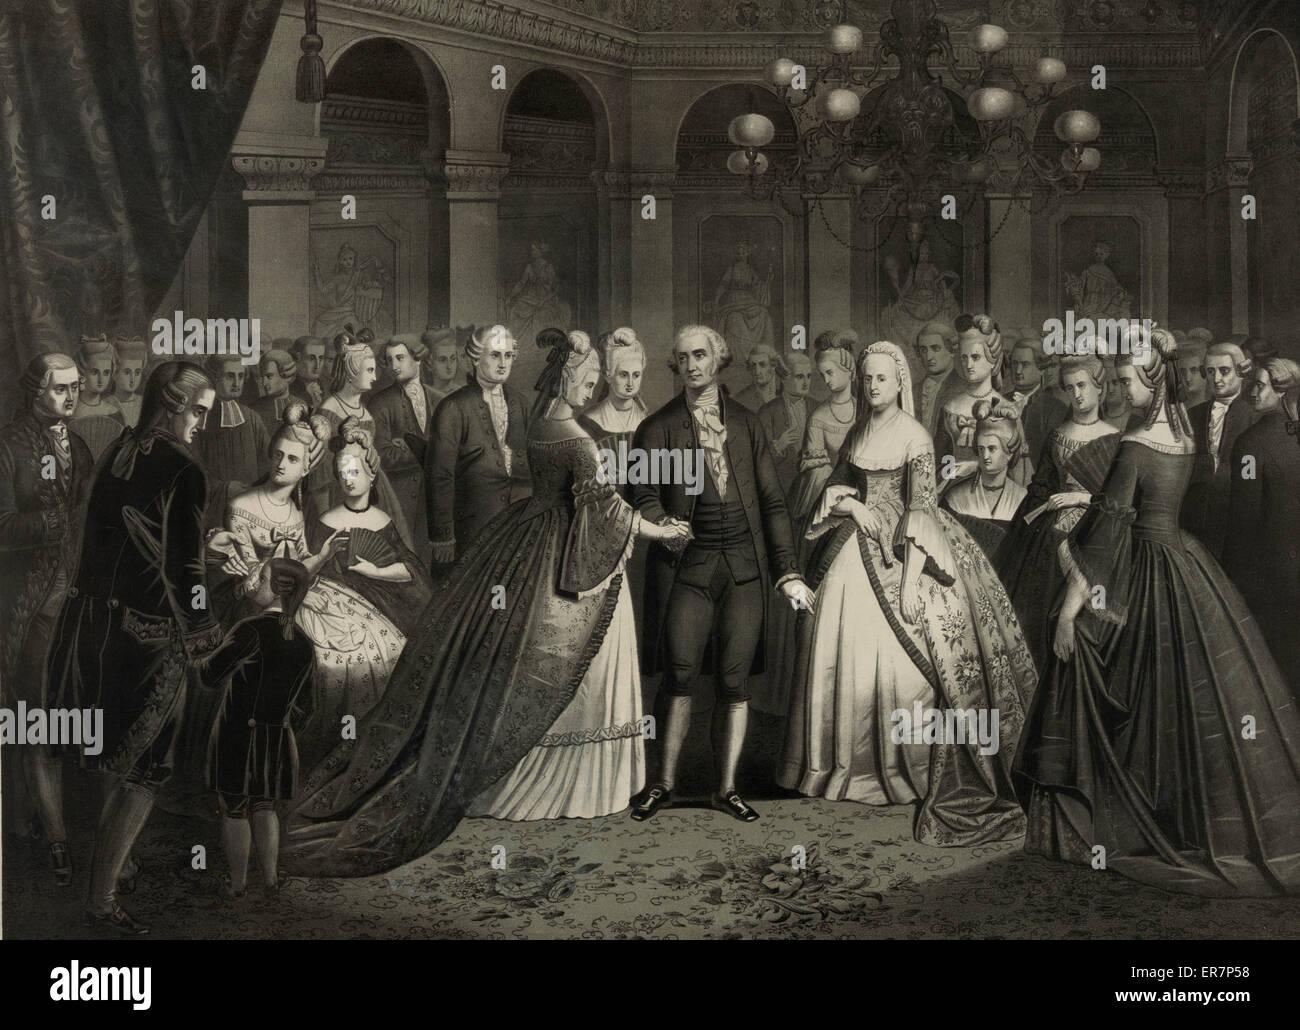 Washington's reception at the White House, 1776. Print showing George and Martha Washington among crowd at reception. - Stock Image